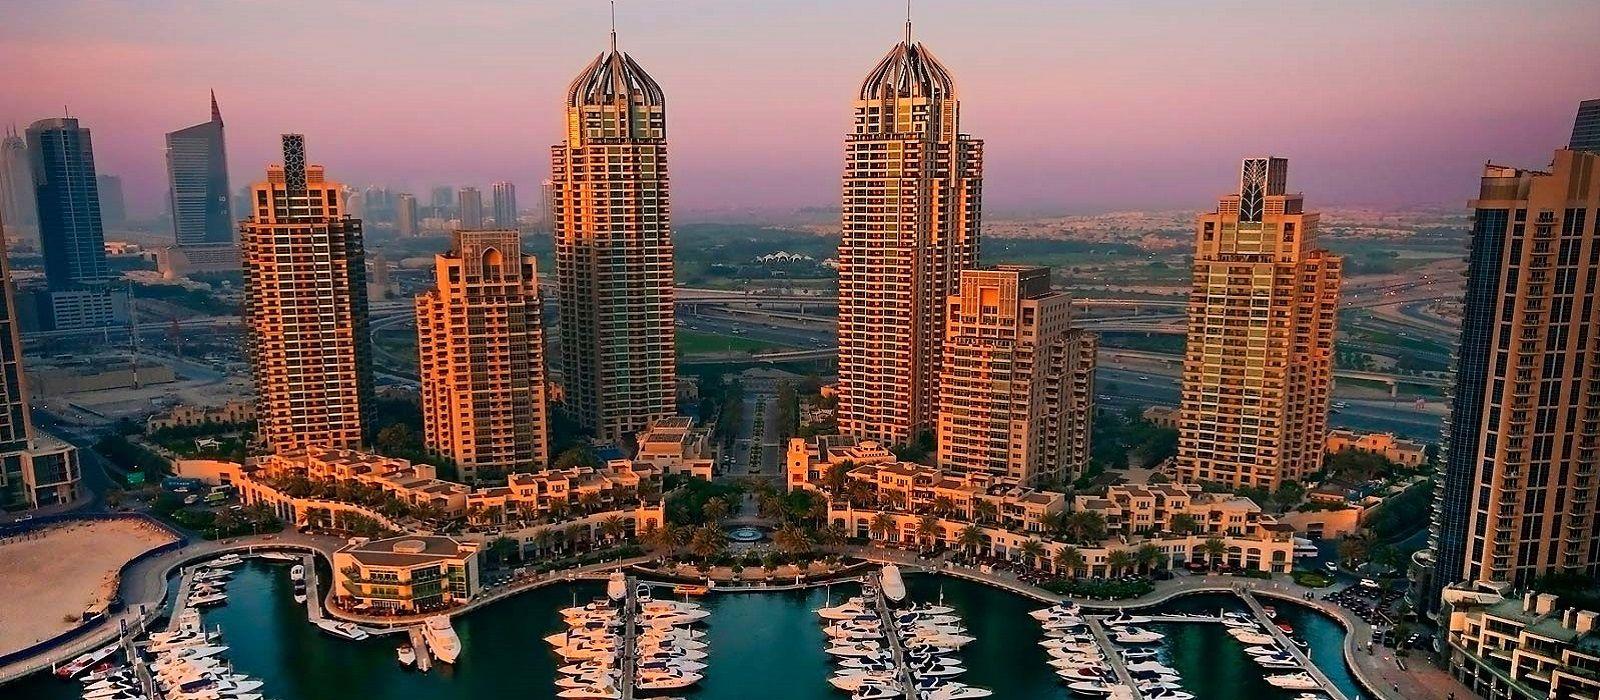 Golden Triangle and Dubai Delights Tour Trip 3